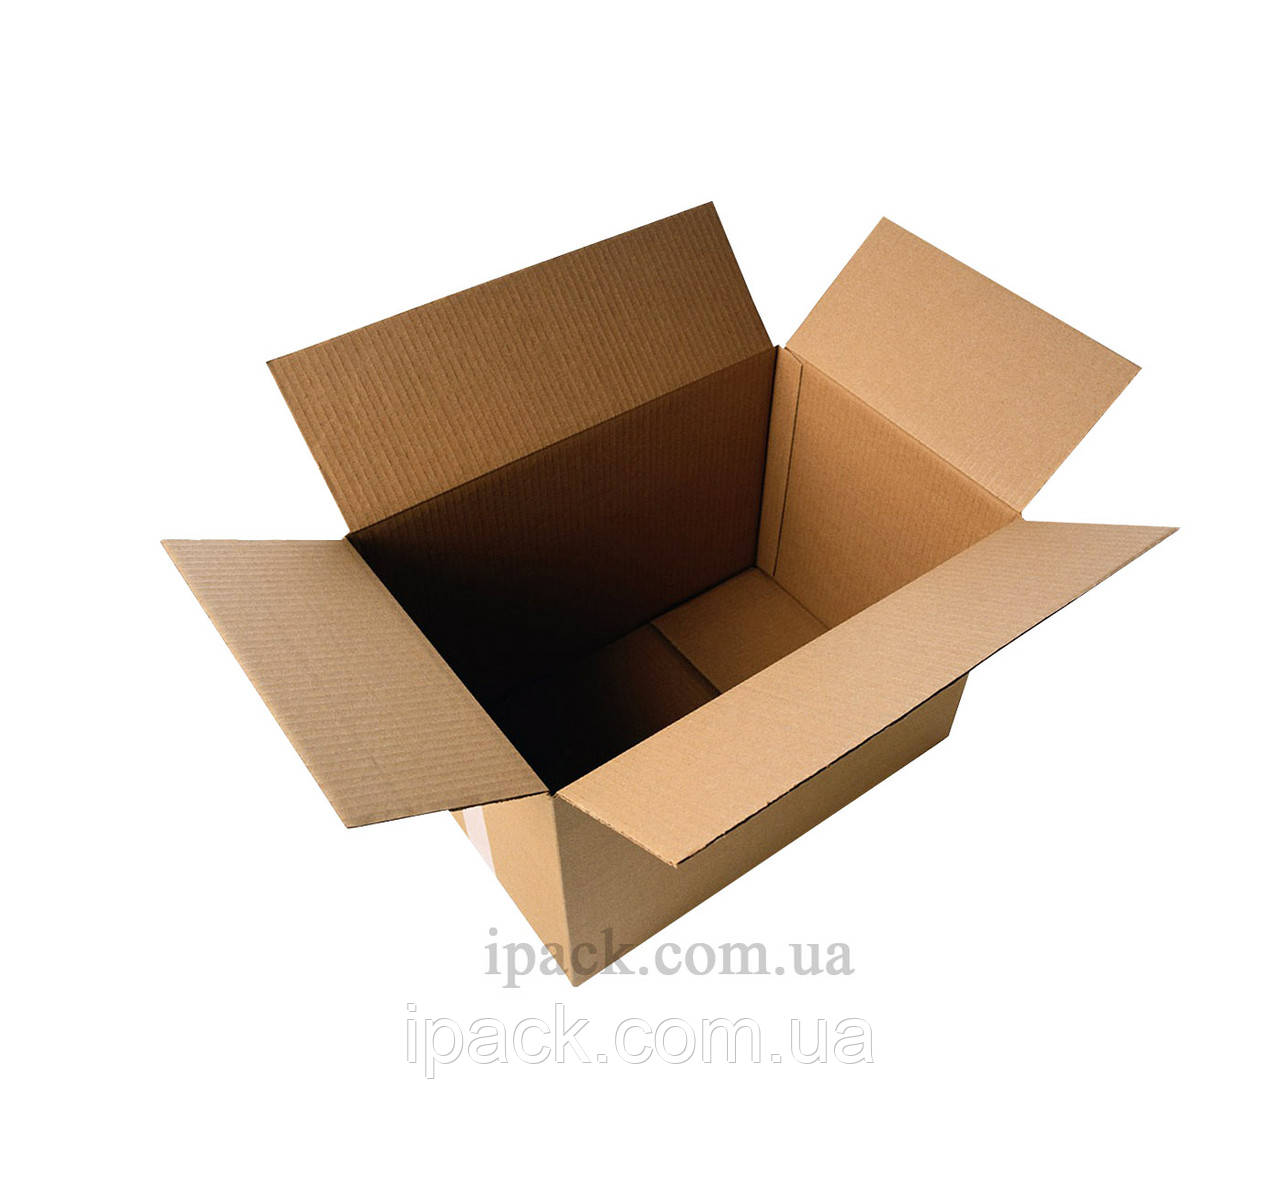 Гофроящик 430*260*140 мм, бурый, четырехклапанный картонный короб